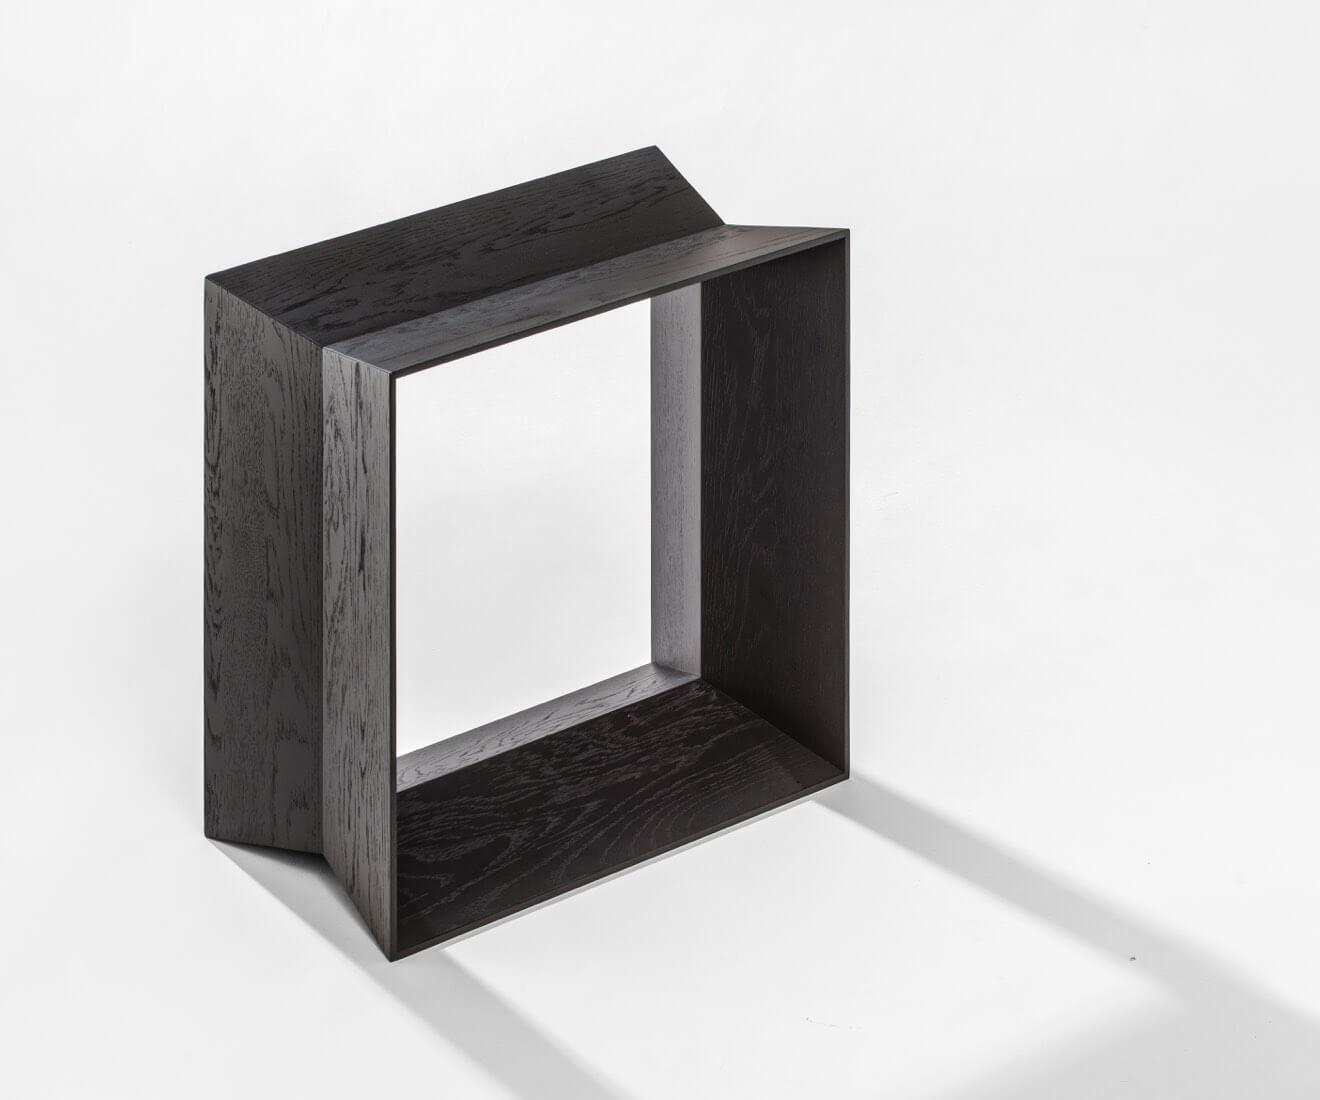 Motarasu Products - Reflex Stool in Black by Akiko Ken Made